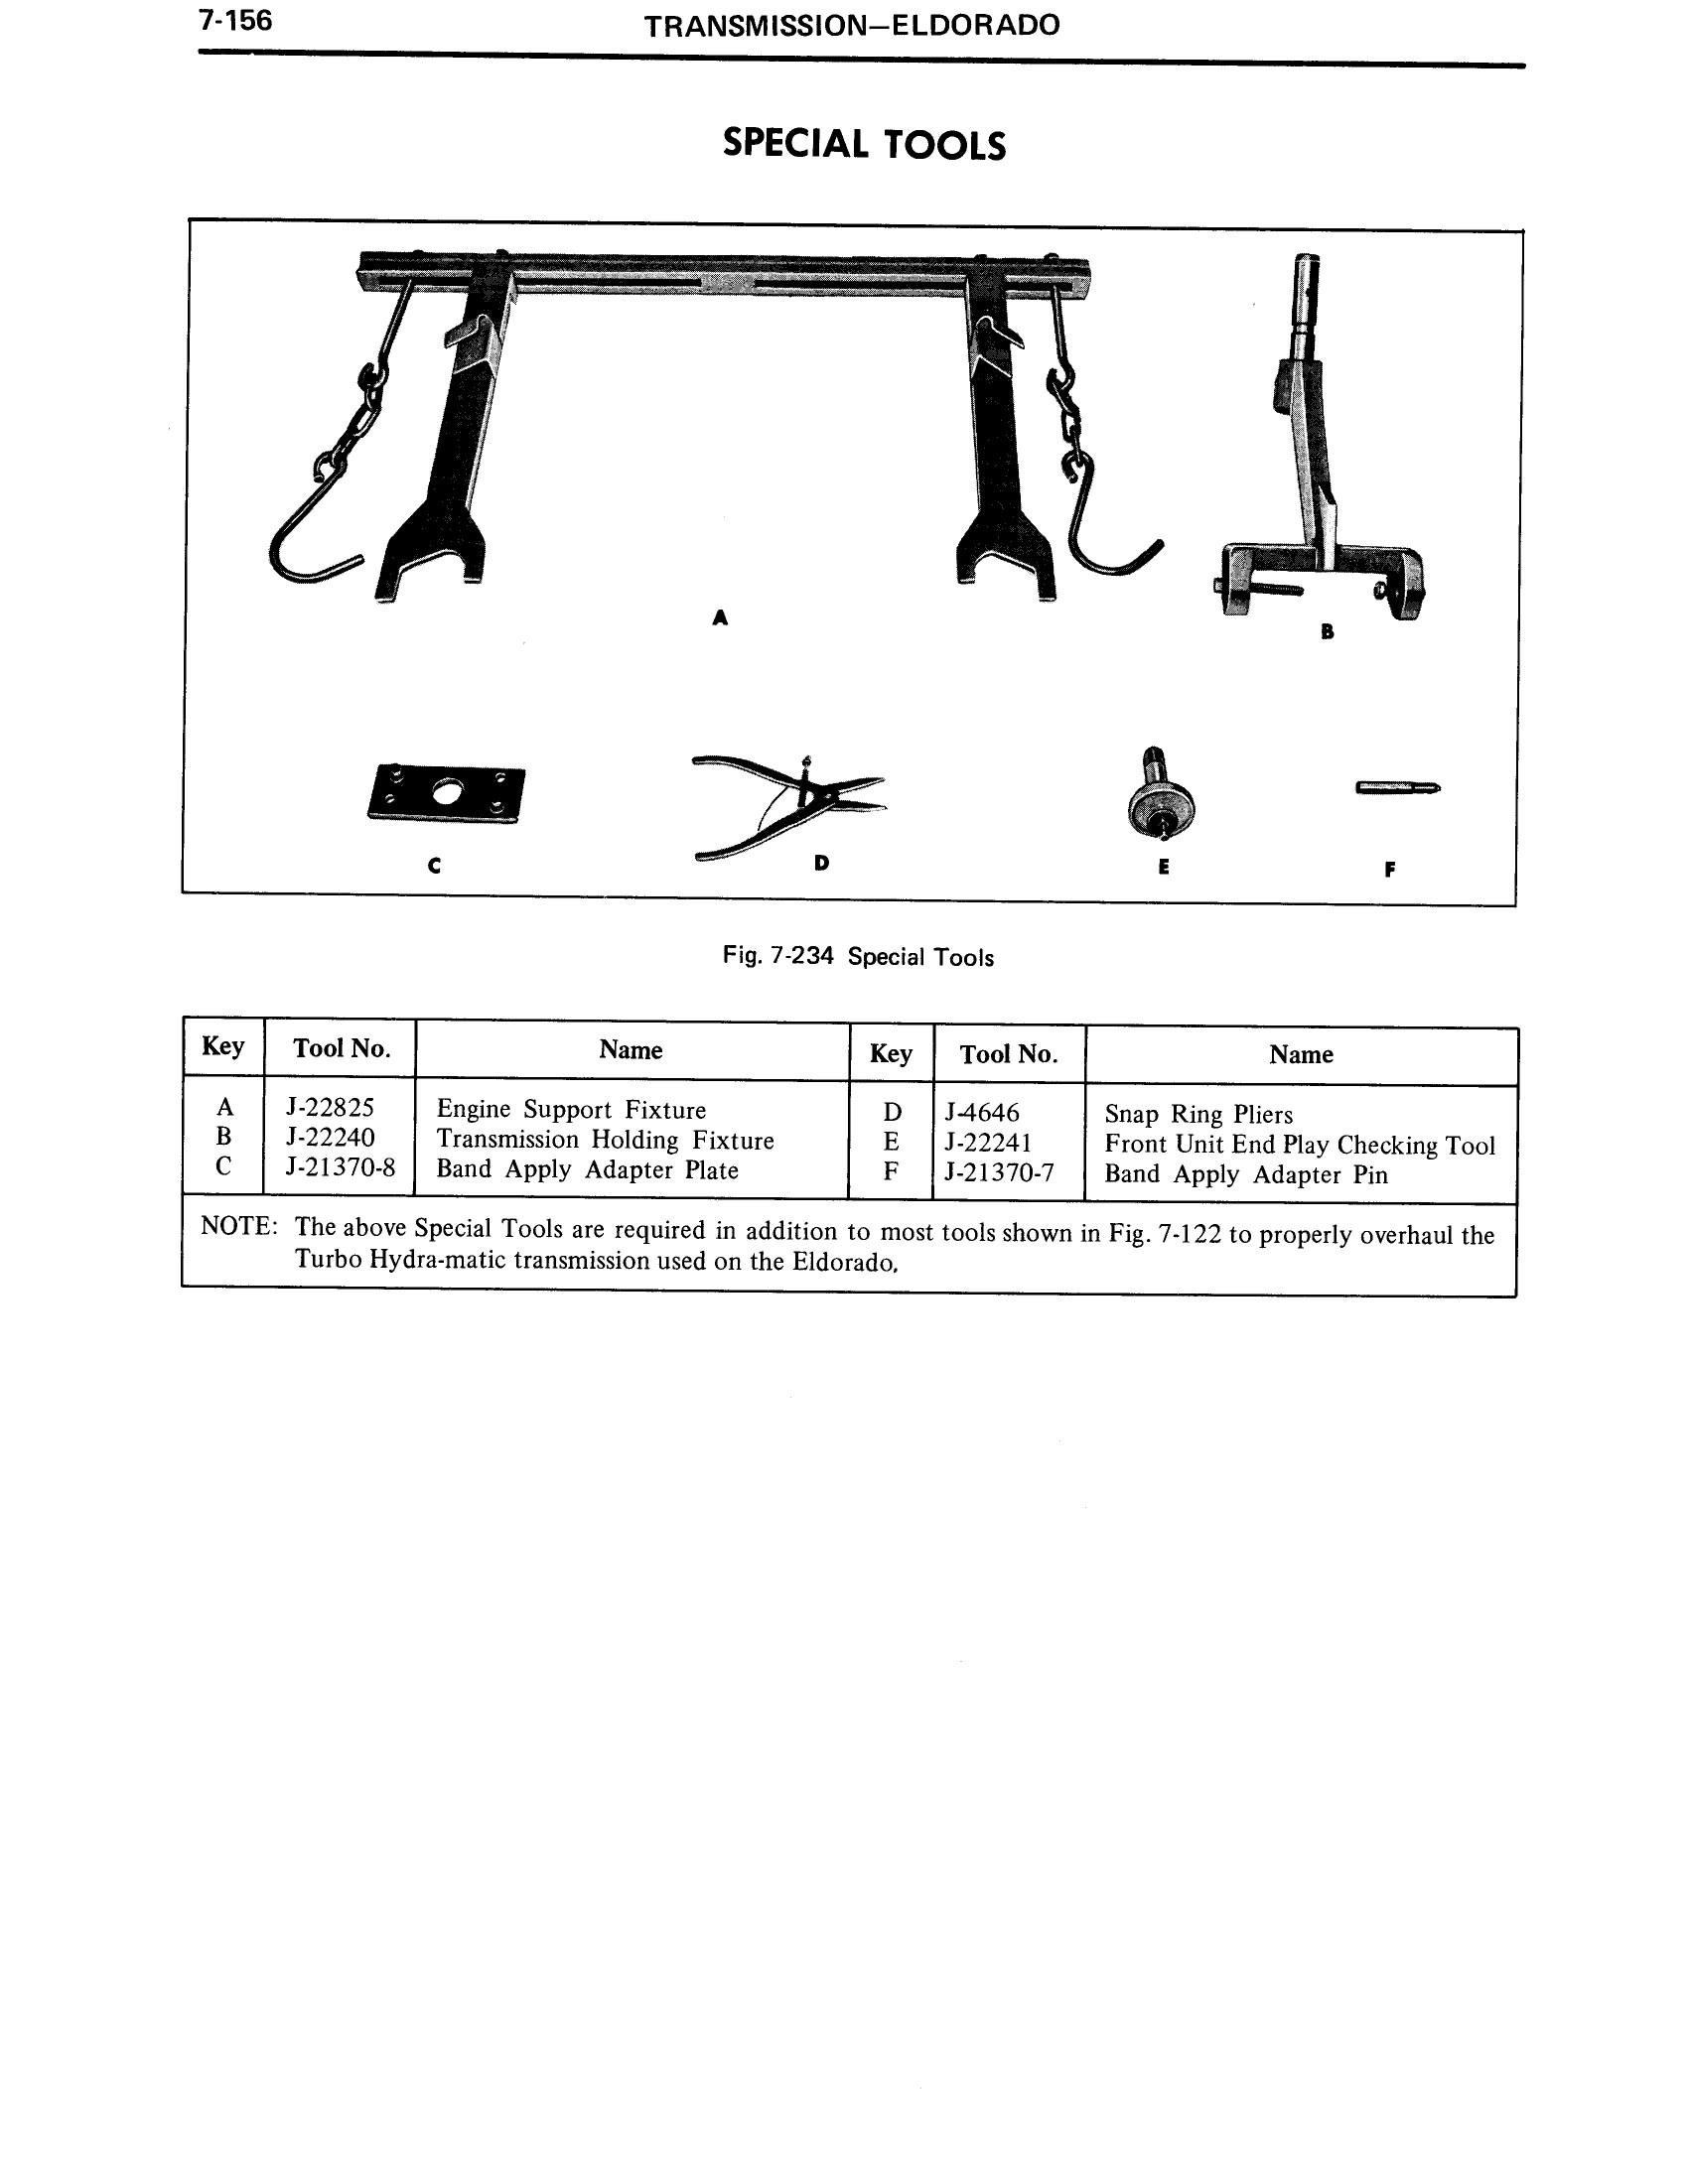 1971 Cadillac Shop Manual- Transmission Page 156 of 156